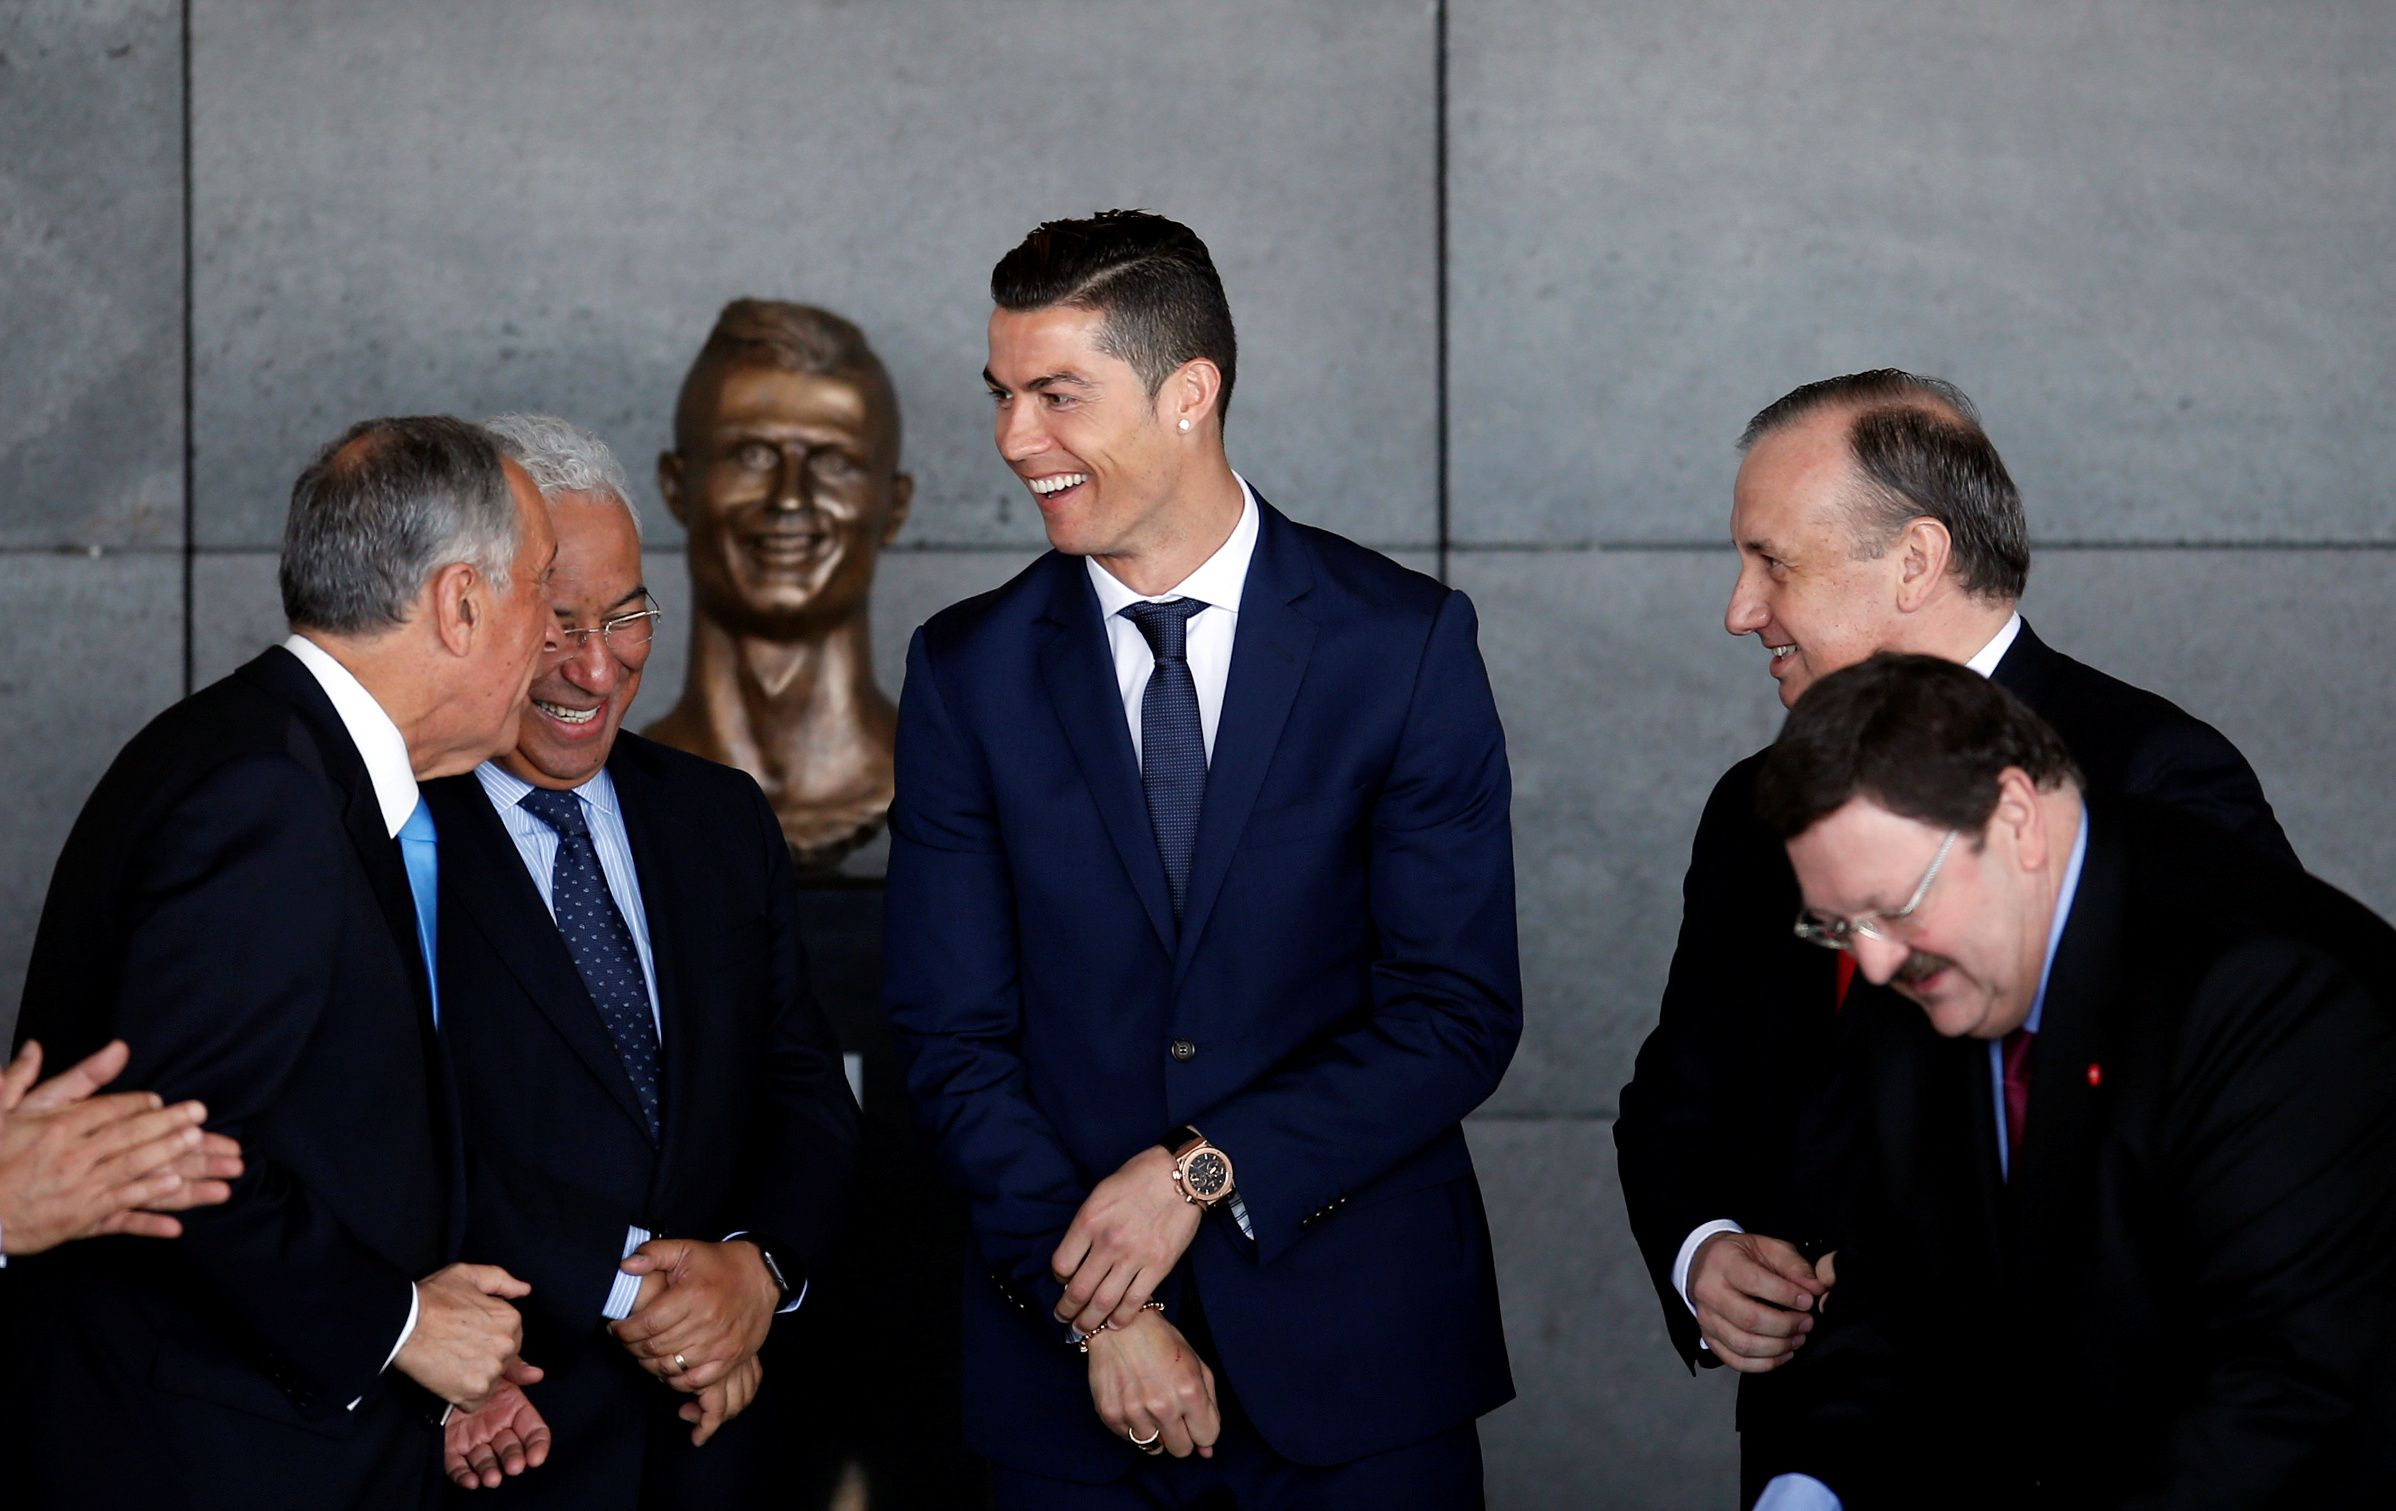 Real Madrid and Portugal star Cristiano Ronaldo